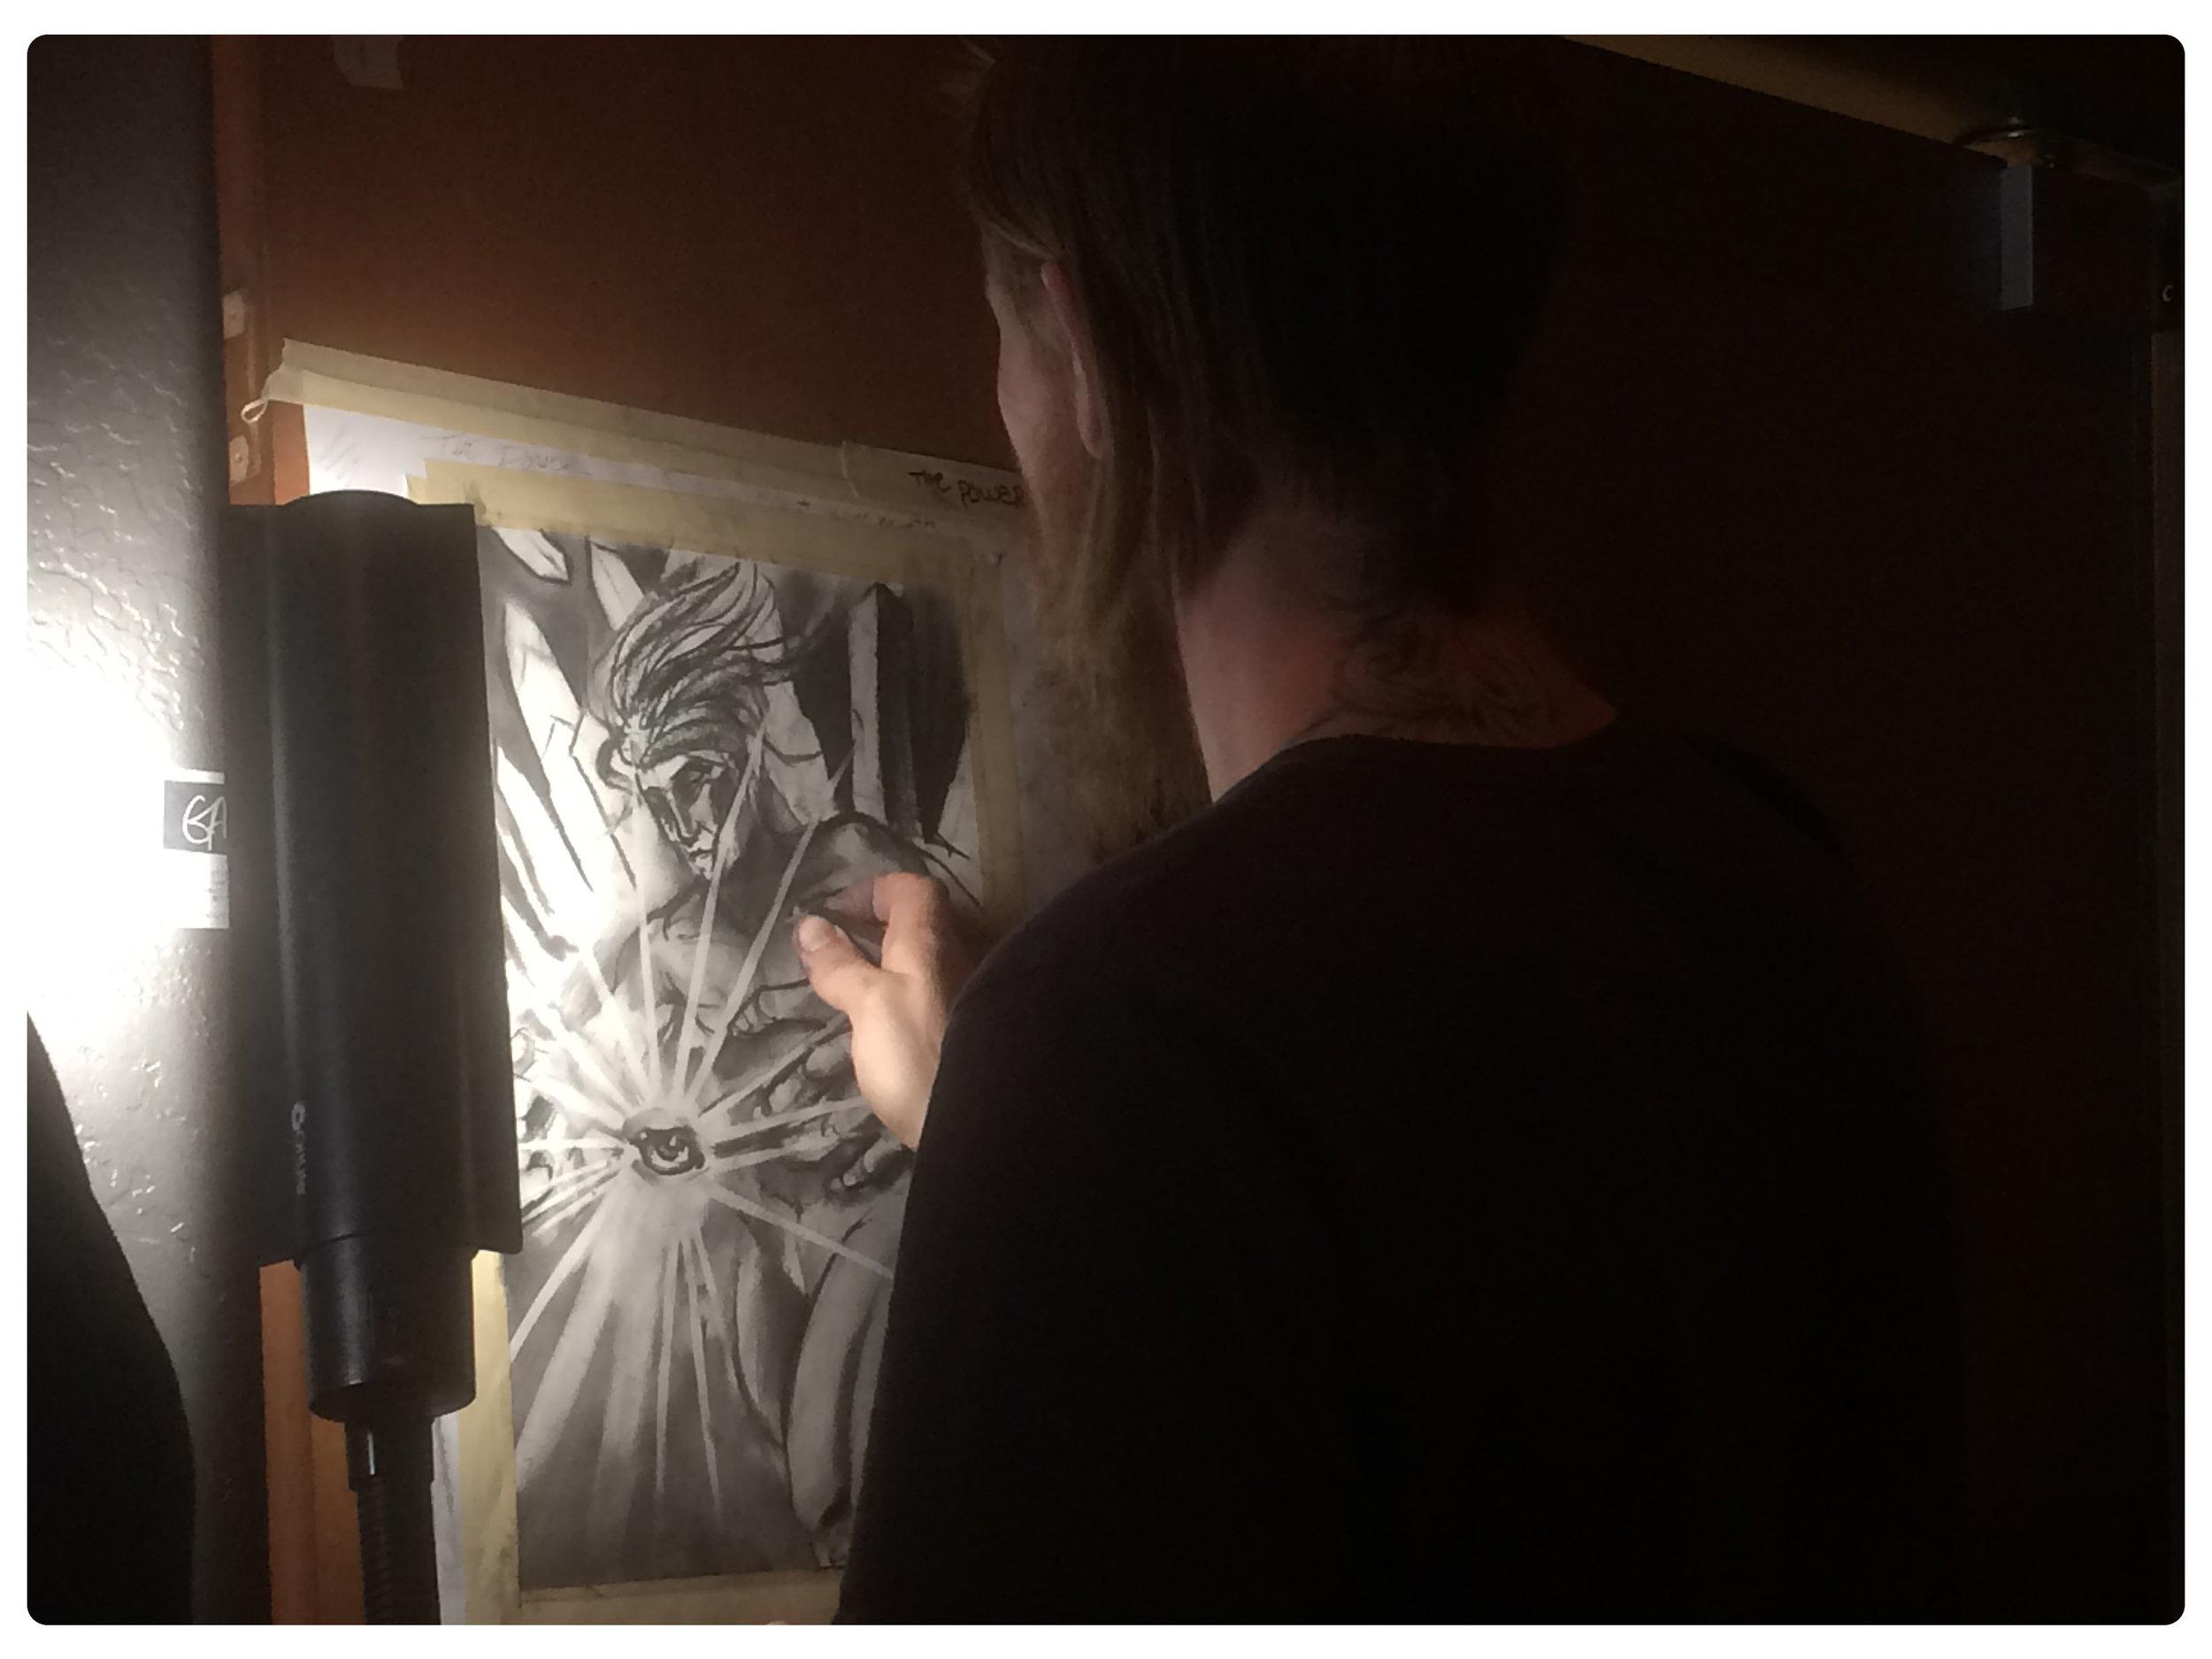 blog_2014_art_live-drawing-event-charcoal-2.jpg